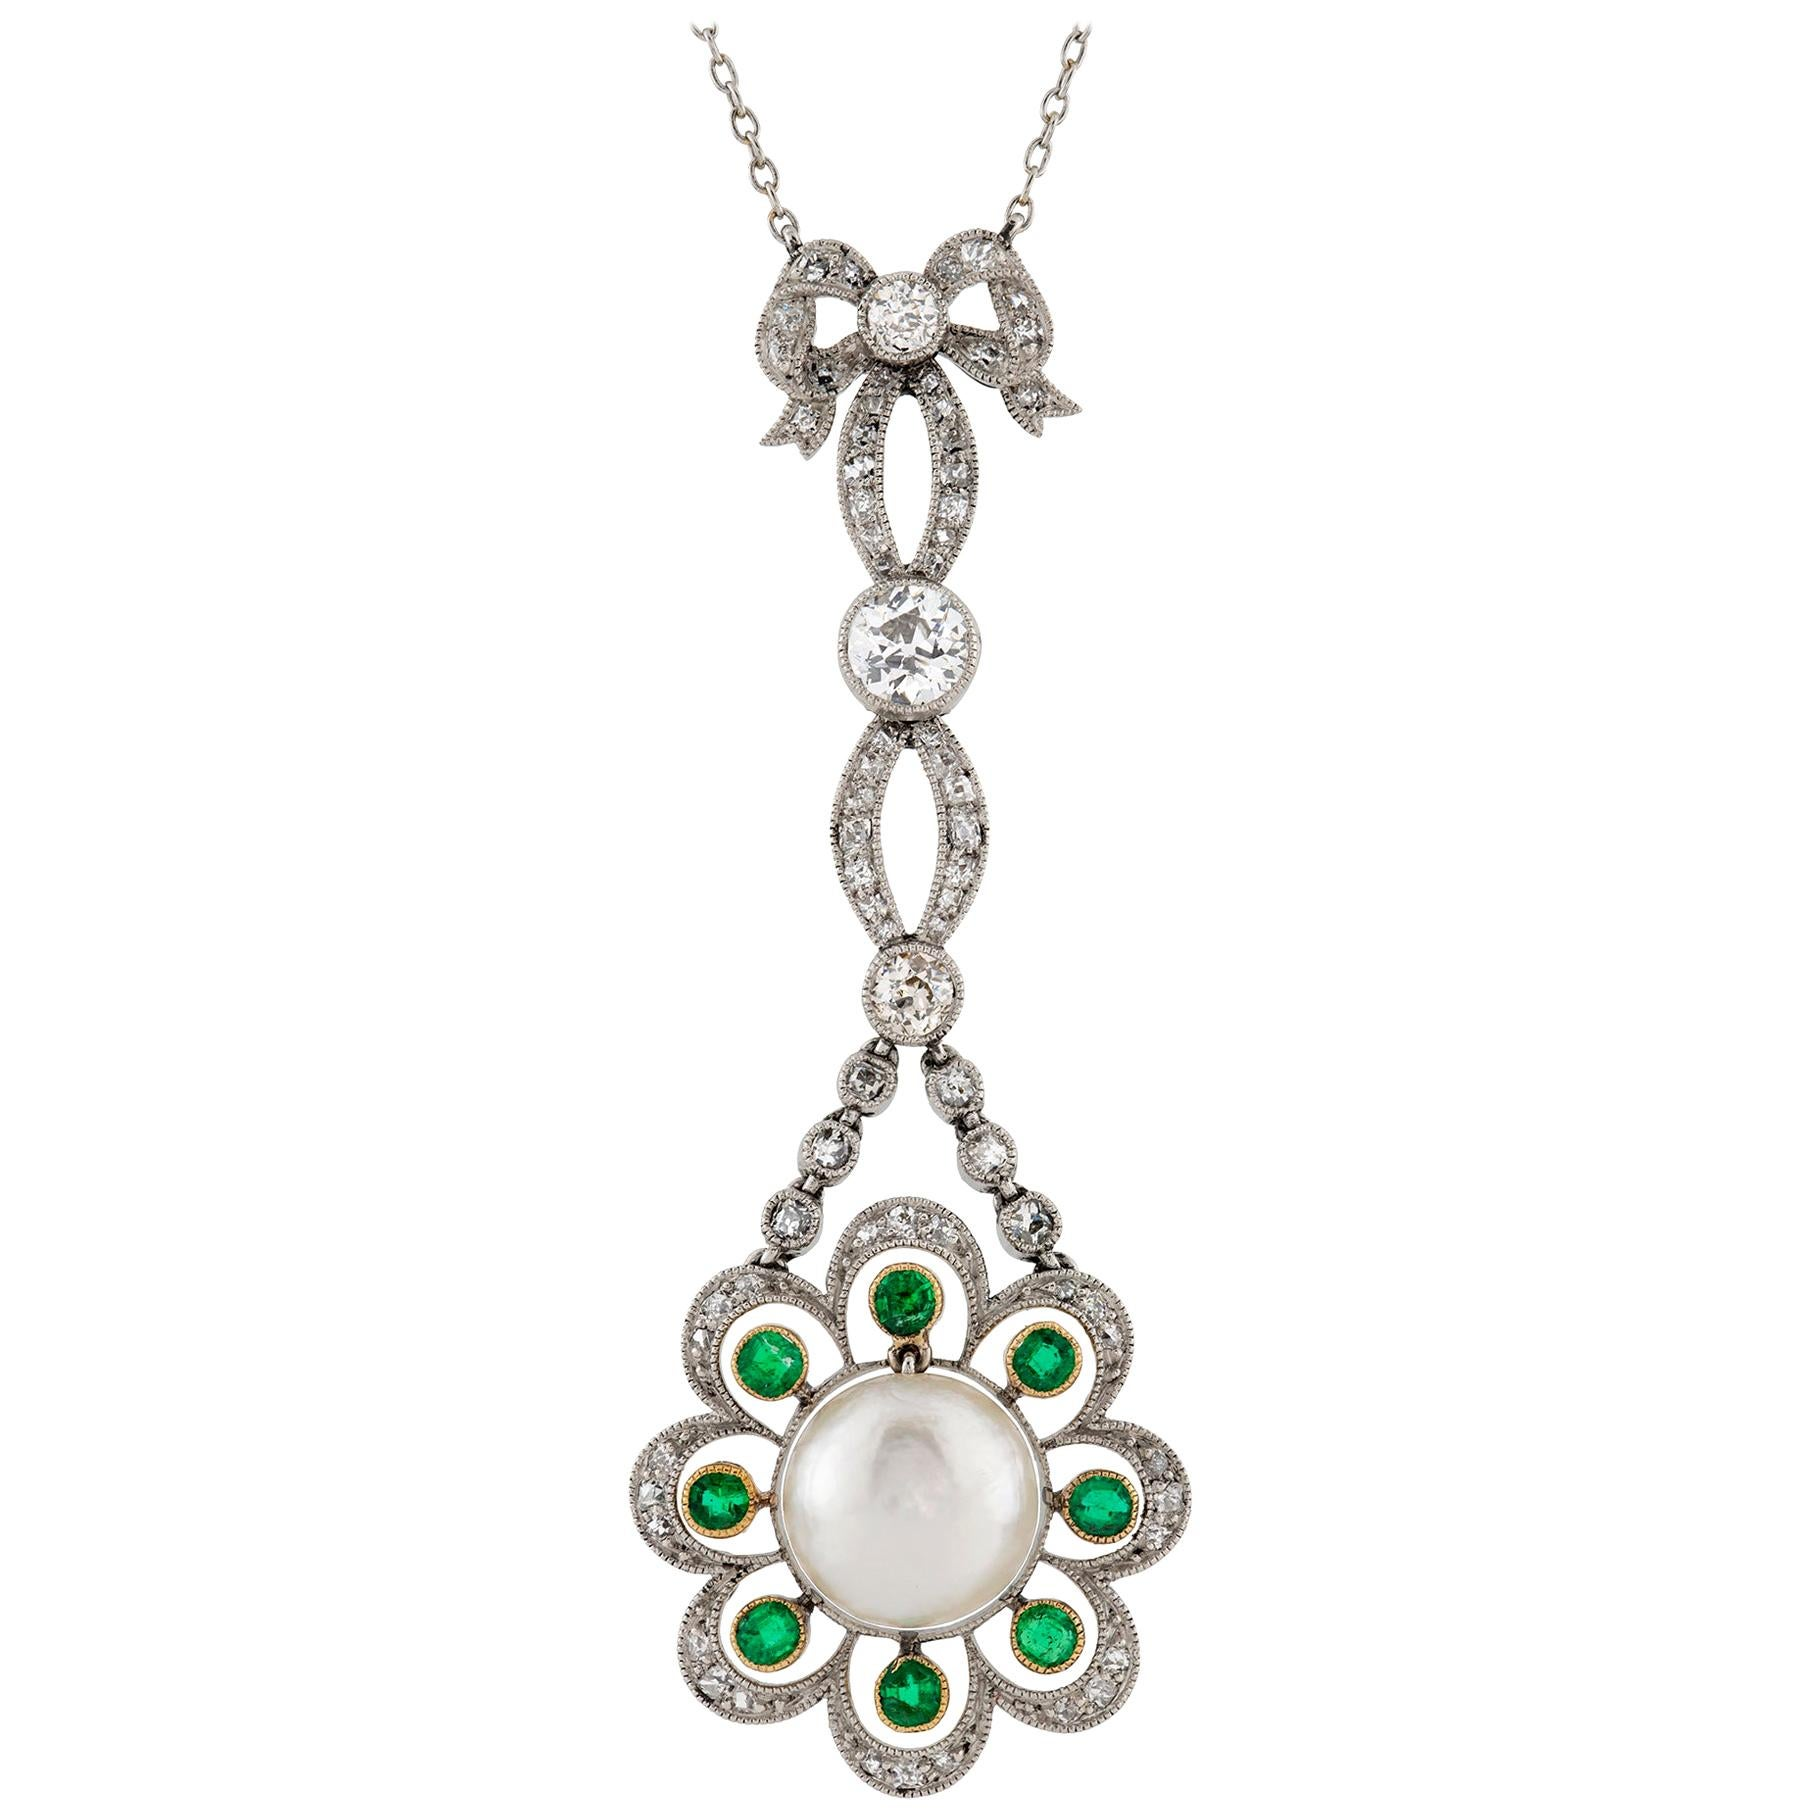 Edwardian Natural Pearl, Diamond and Emerald Pendant